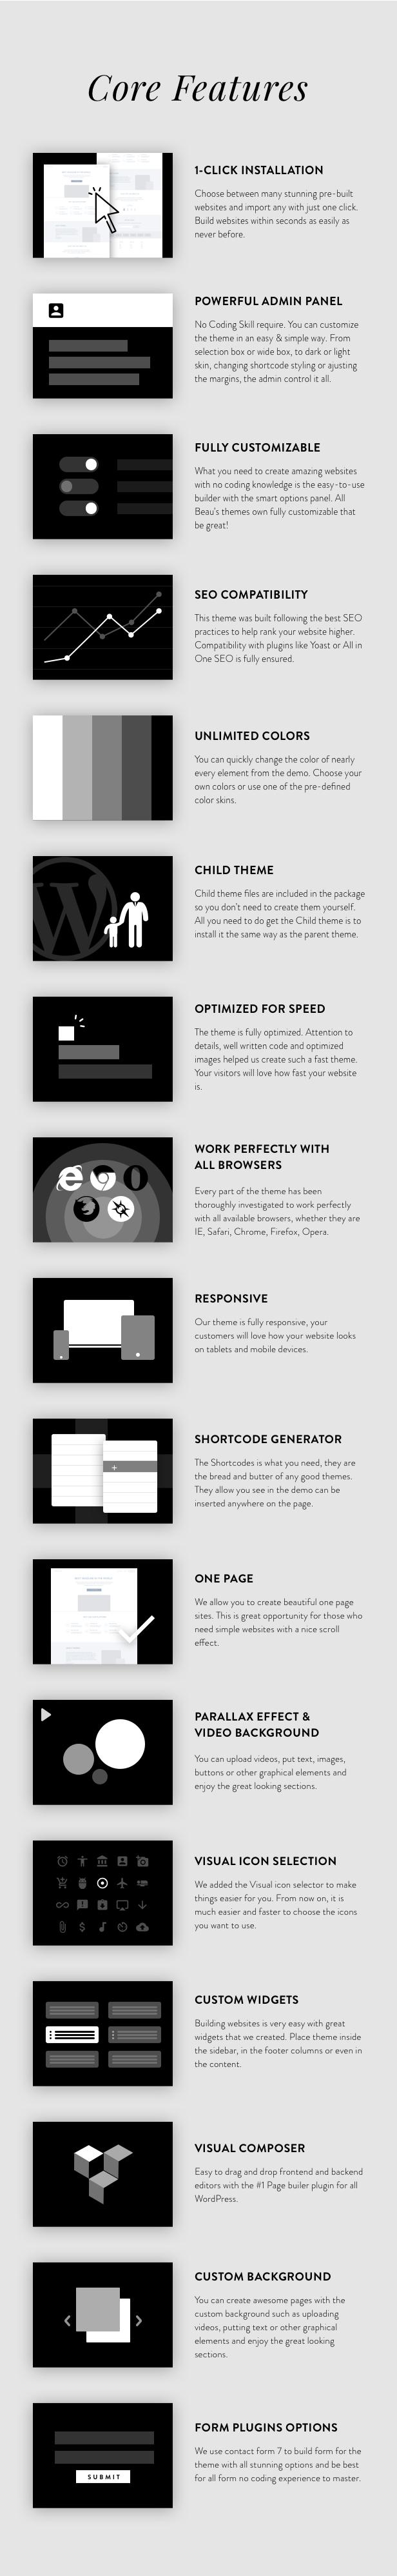 FilmMaker WordPress Theme: Filmstudio - Filmproduktion - Video Blogger - Kreativagentur - 4